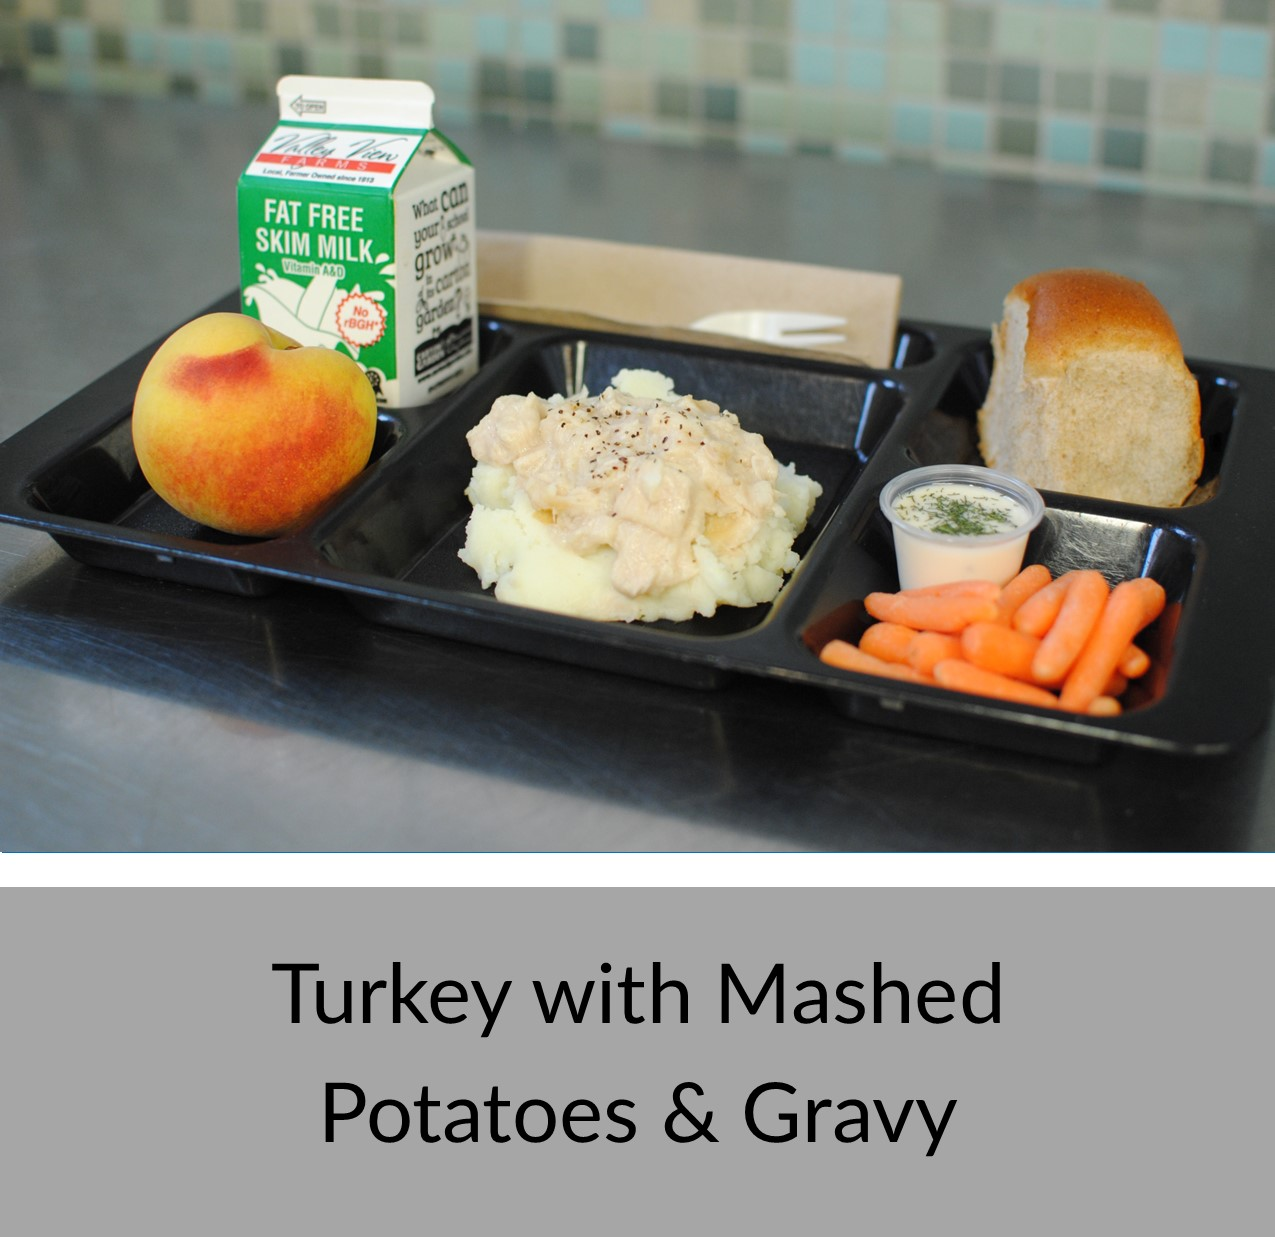 Turkey with Gravy & Mashed Potatoes